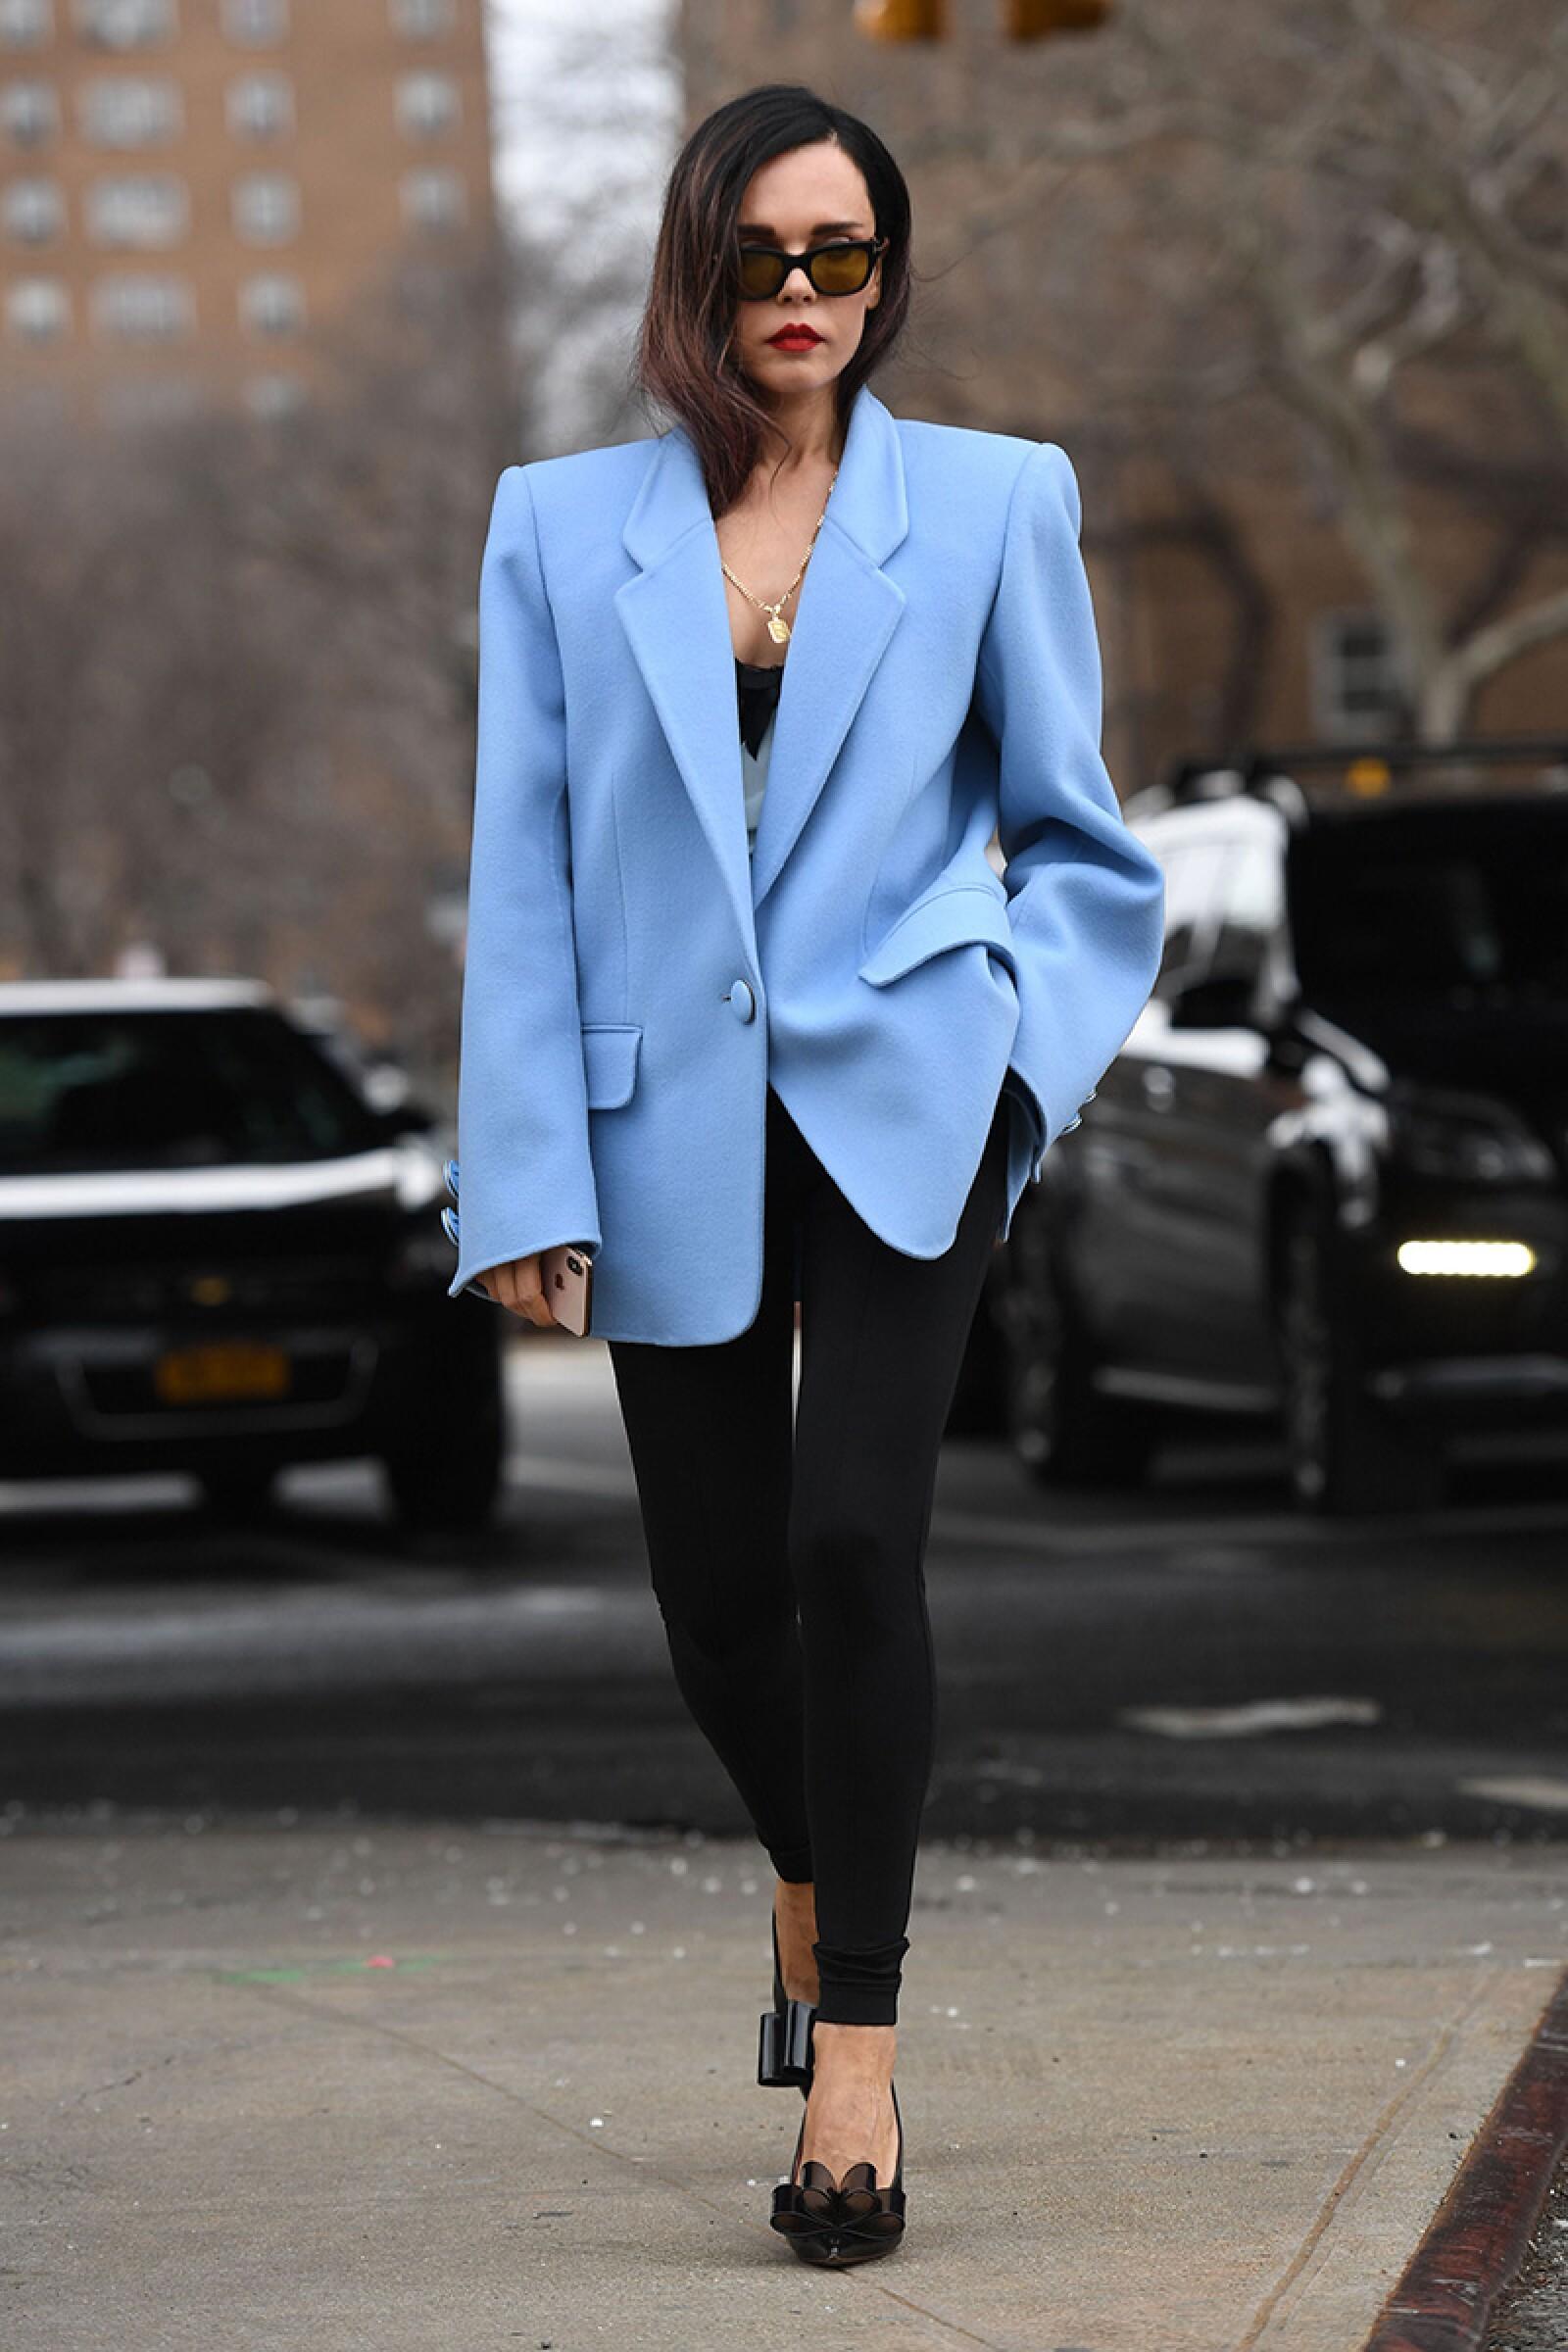 Street Style, Fall Winter 2019, New York Fashion Week, USA - 13 Feb 2019